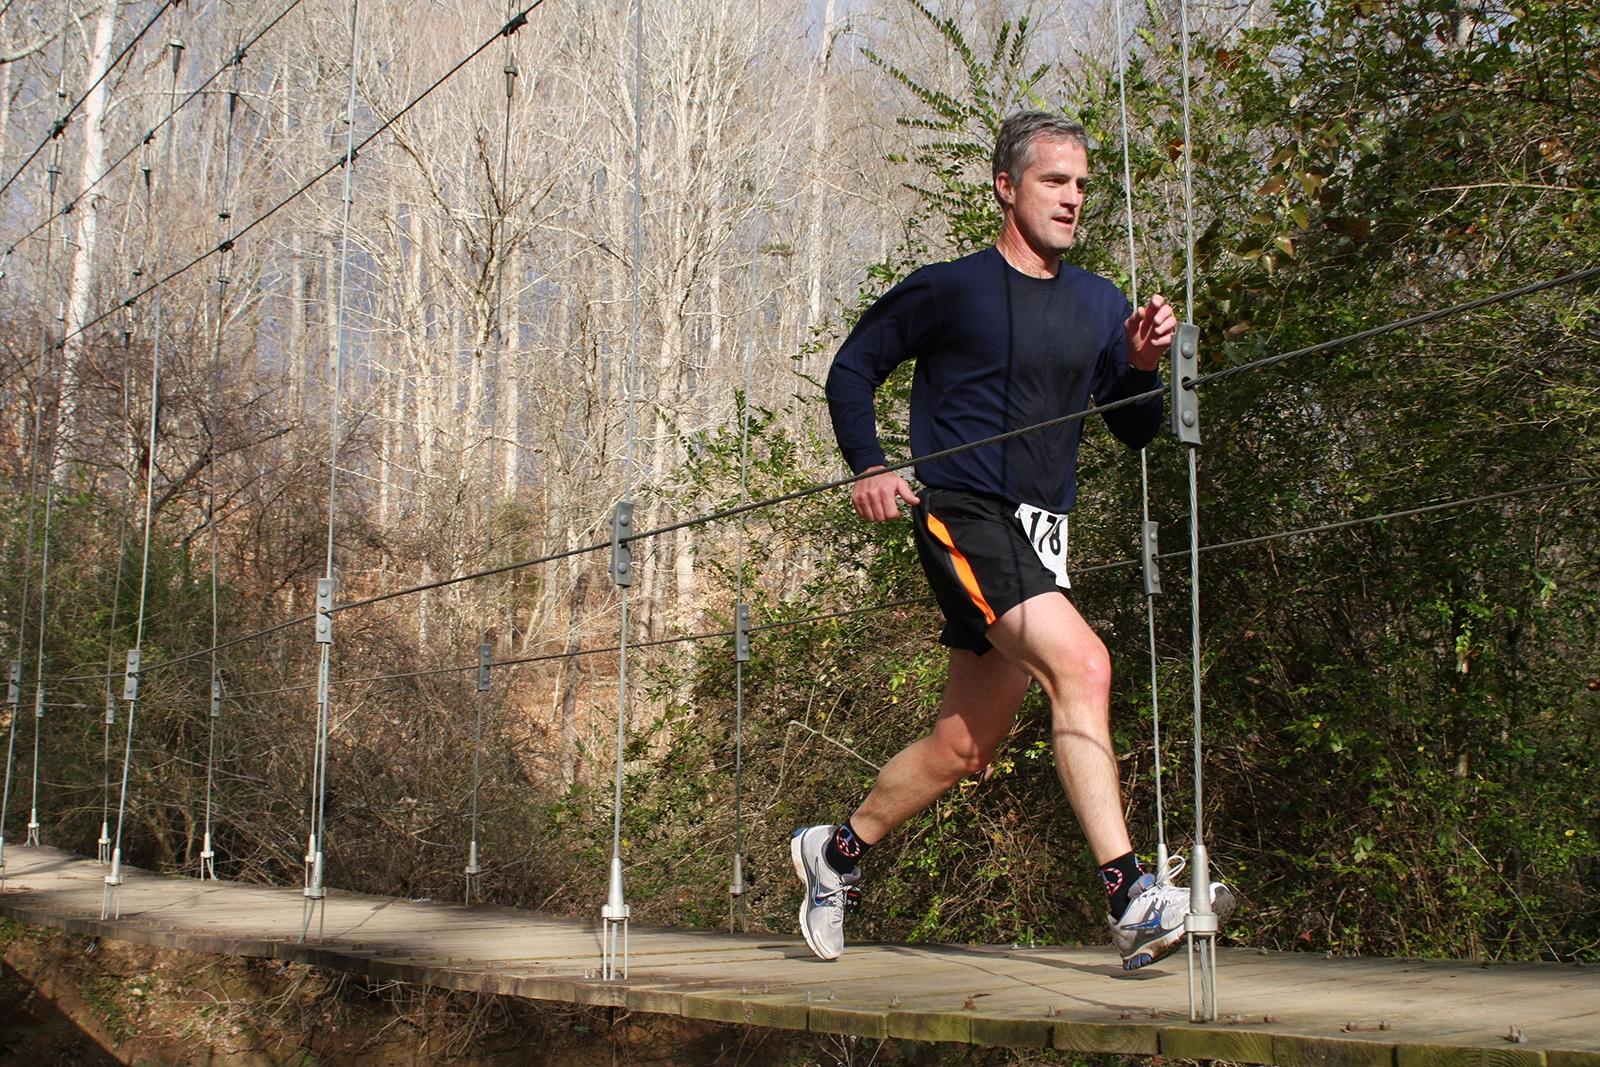 Man running across suspension bridge in race